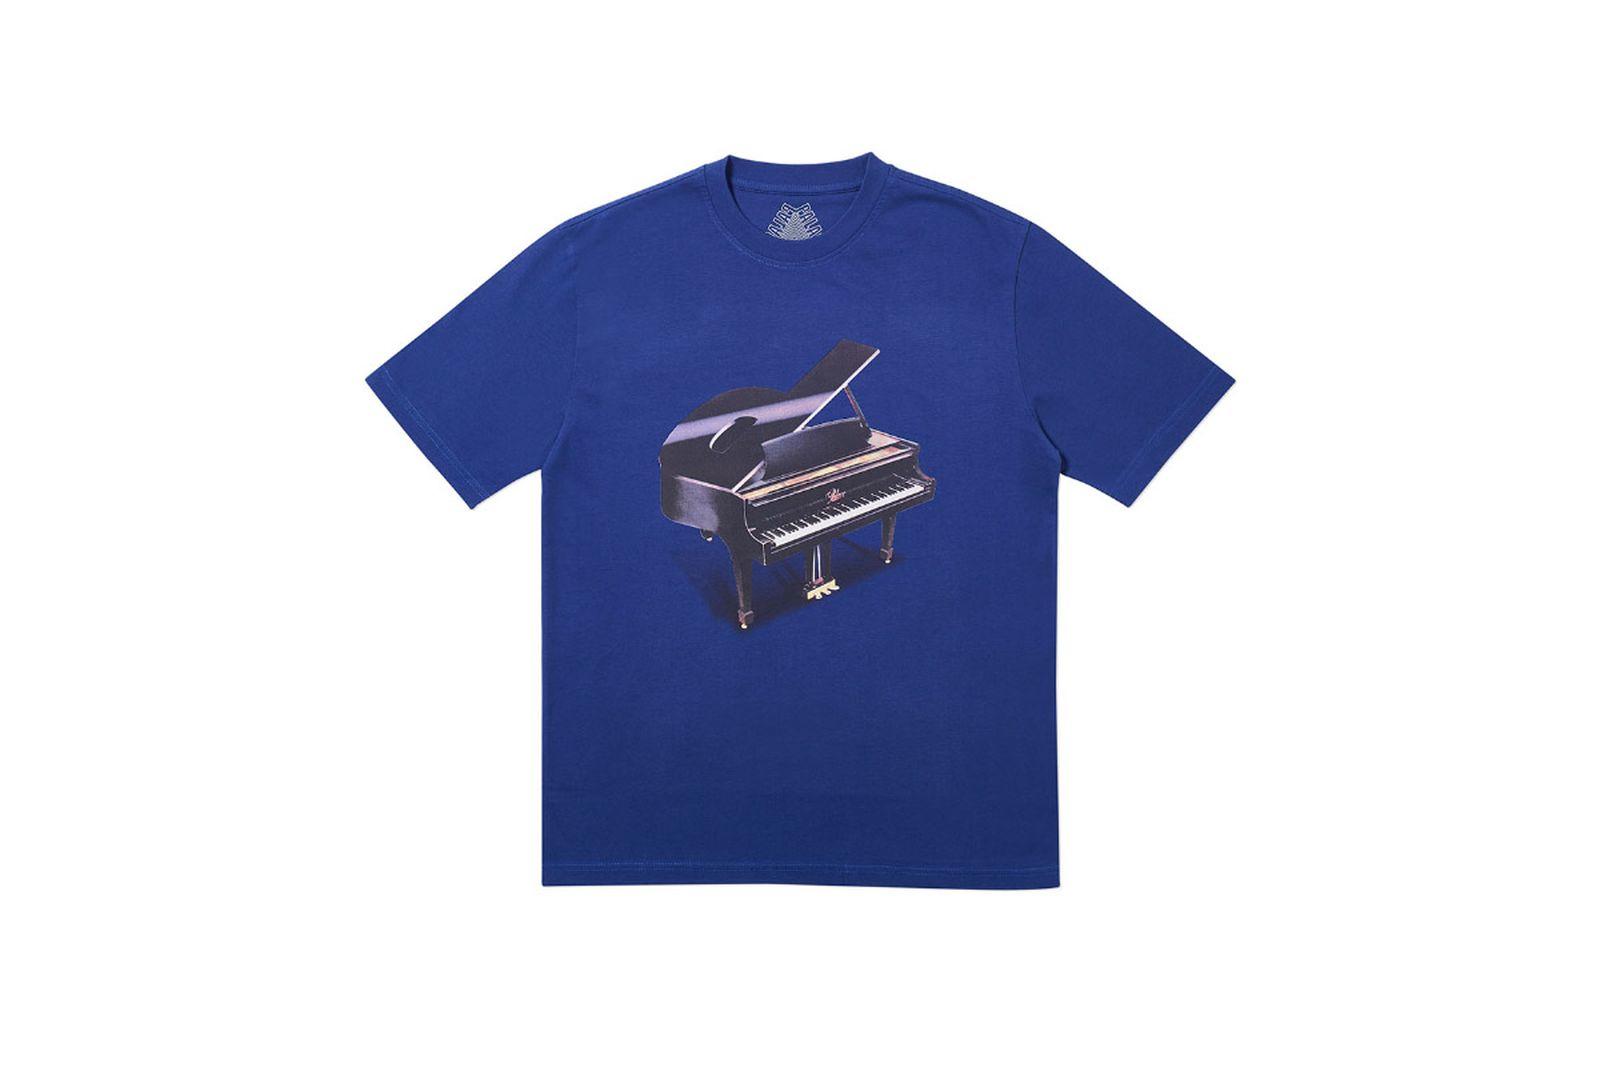 Palace 2019 Autumn T Shirt Grand blue